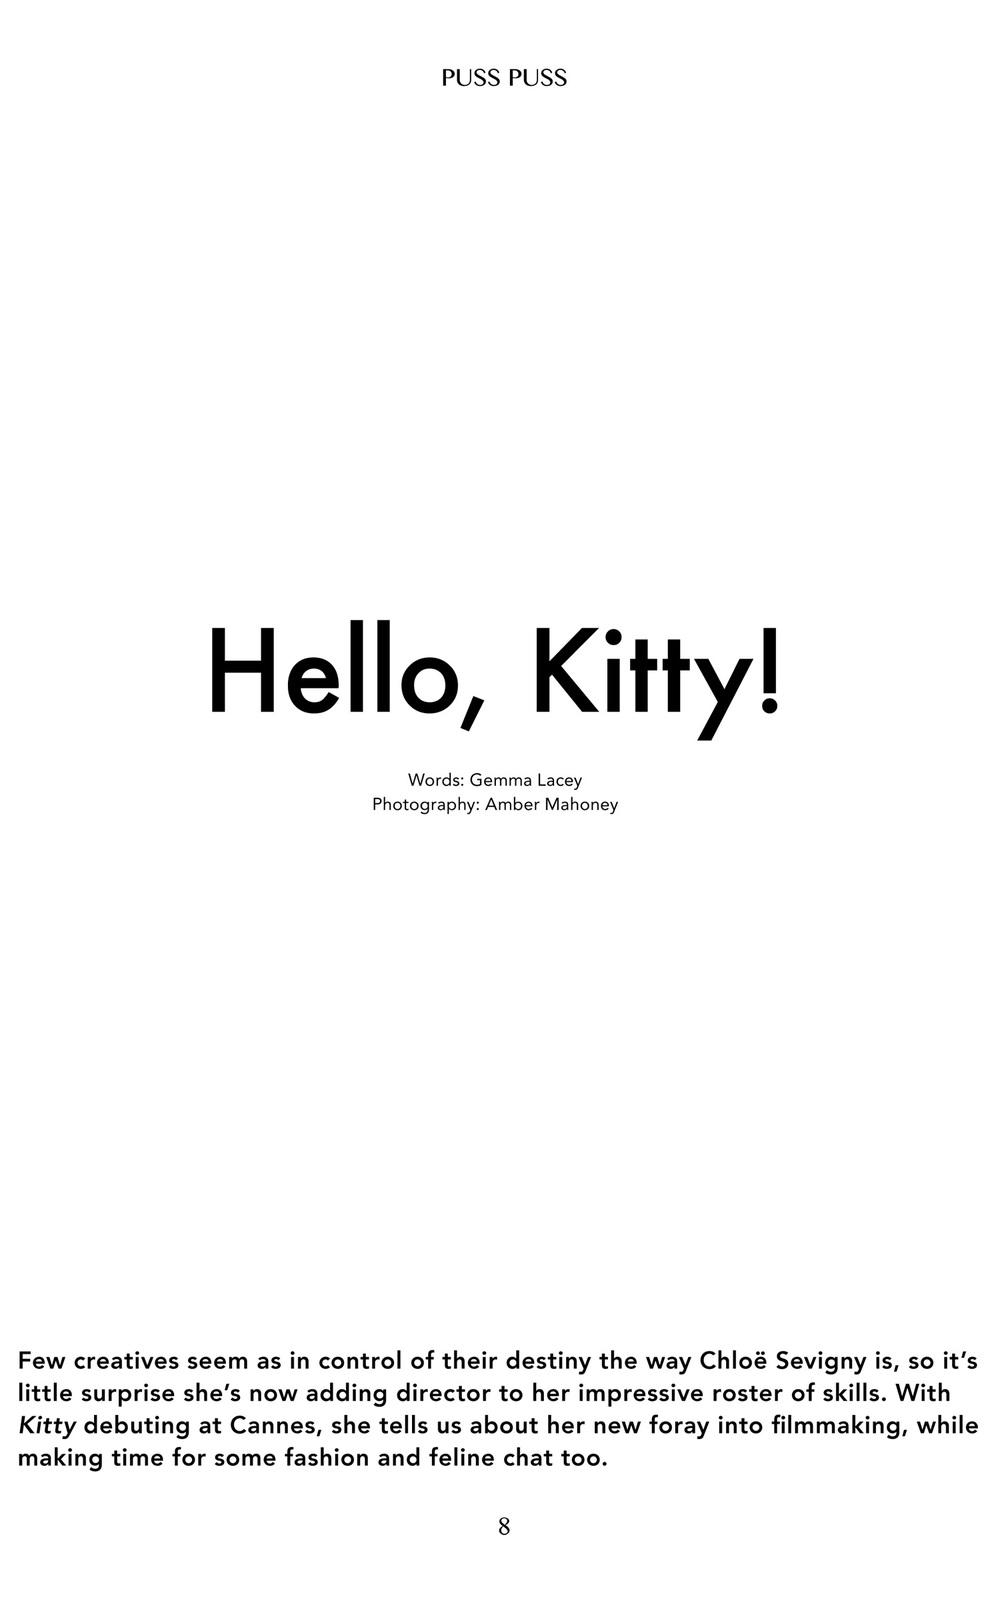 chloe_sevigny_amber_mahoney_puss_puss_magazine_cover_010.jpg